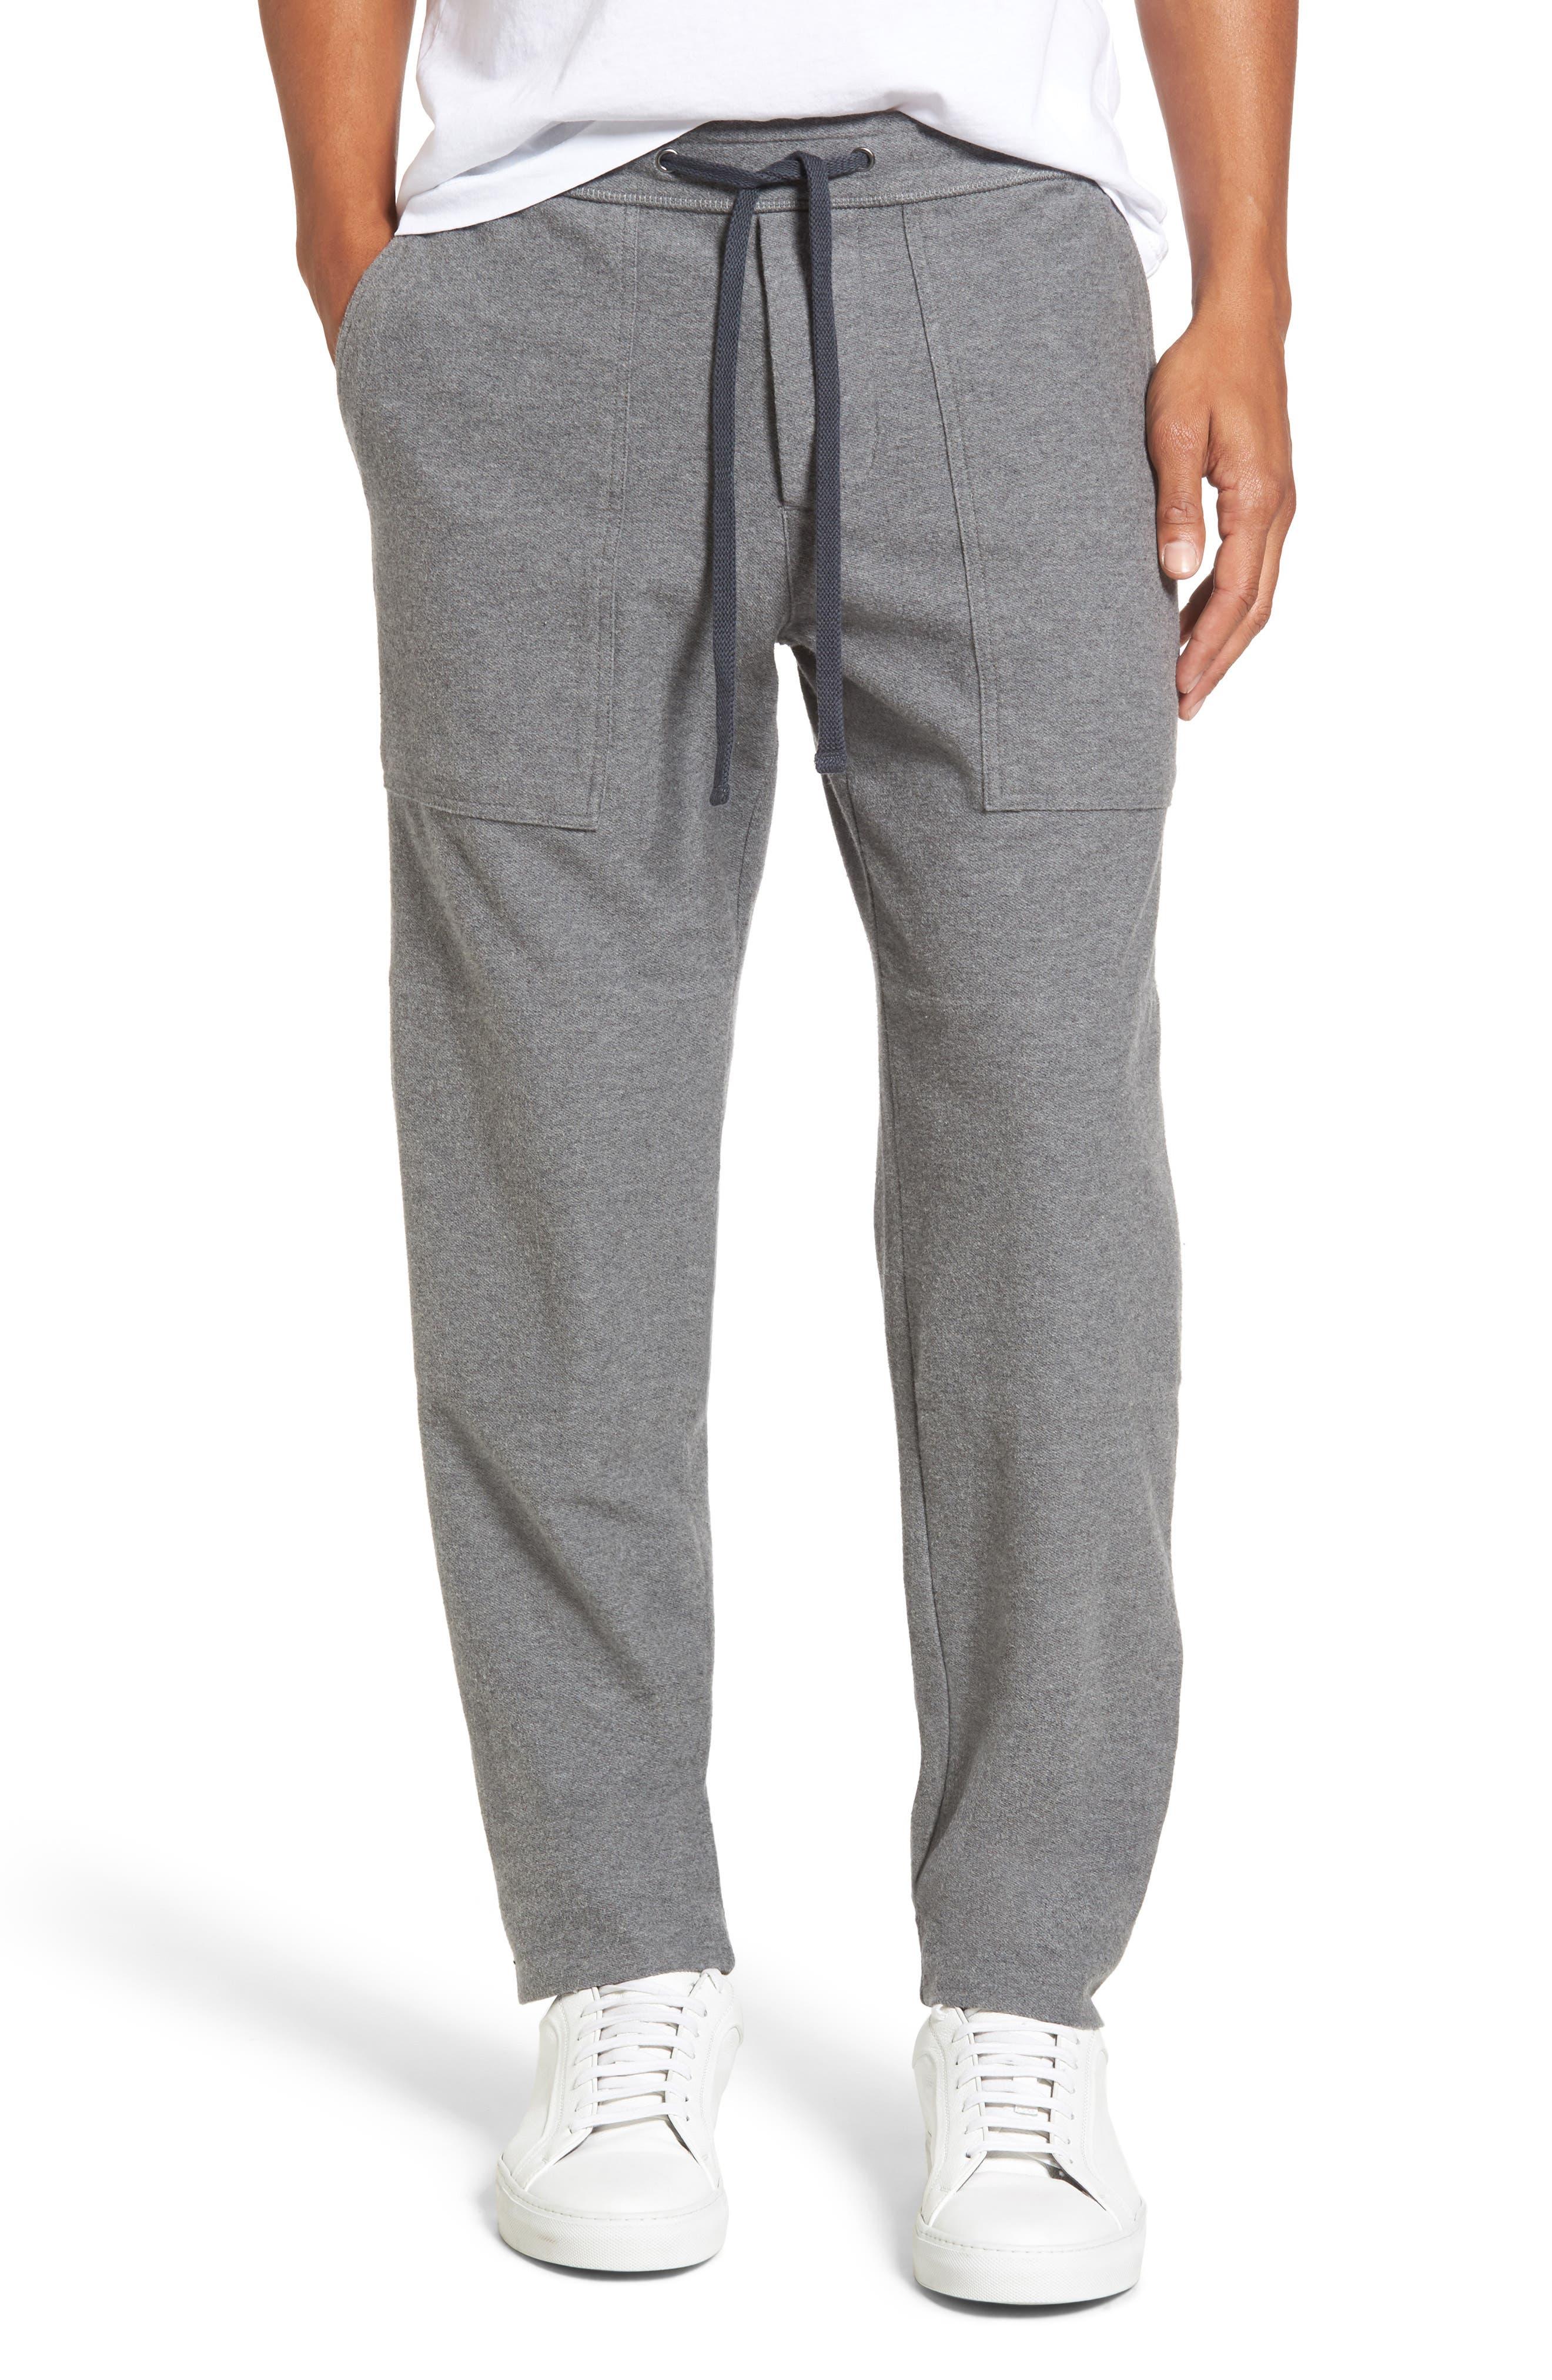 Heathered Knit Lounge Pants,                             Main thumbnail 1, color,                             086